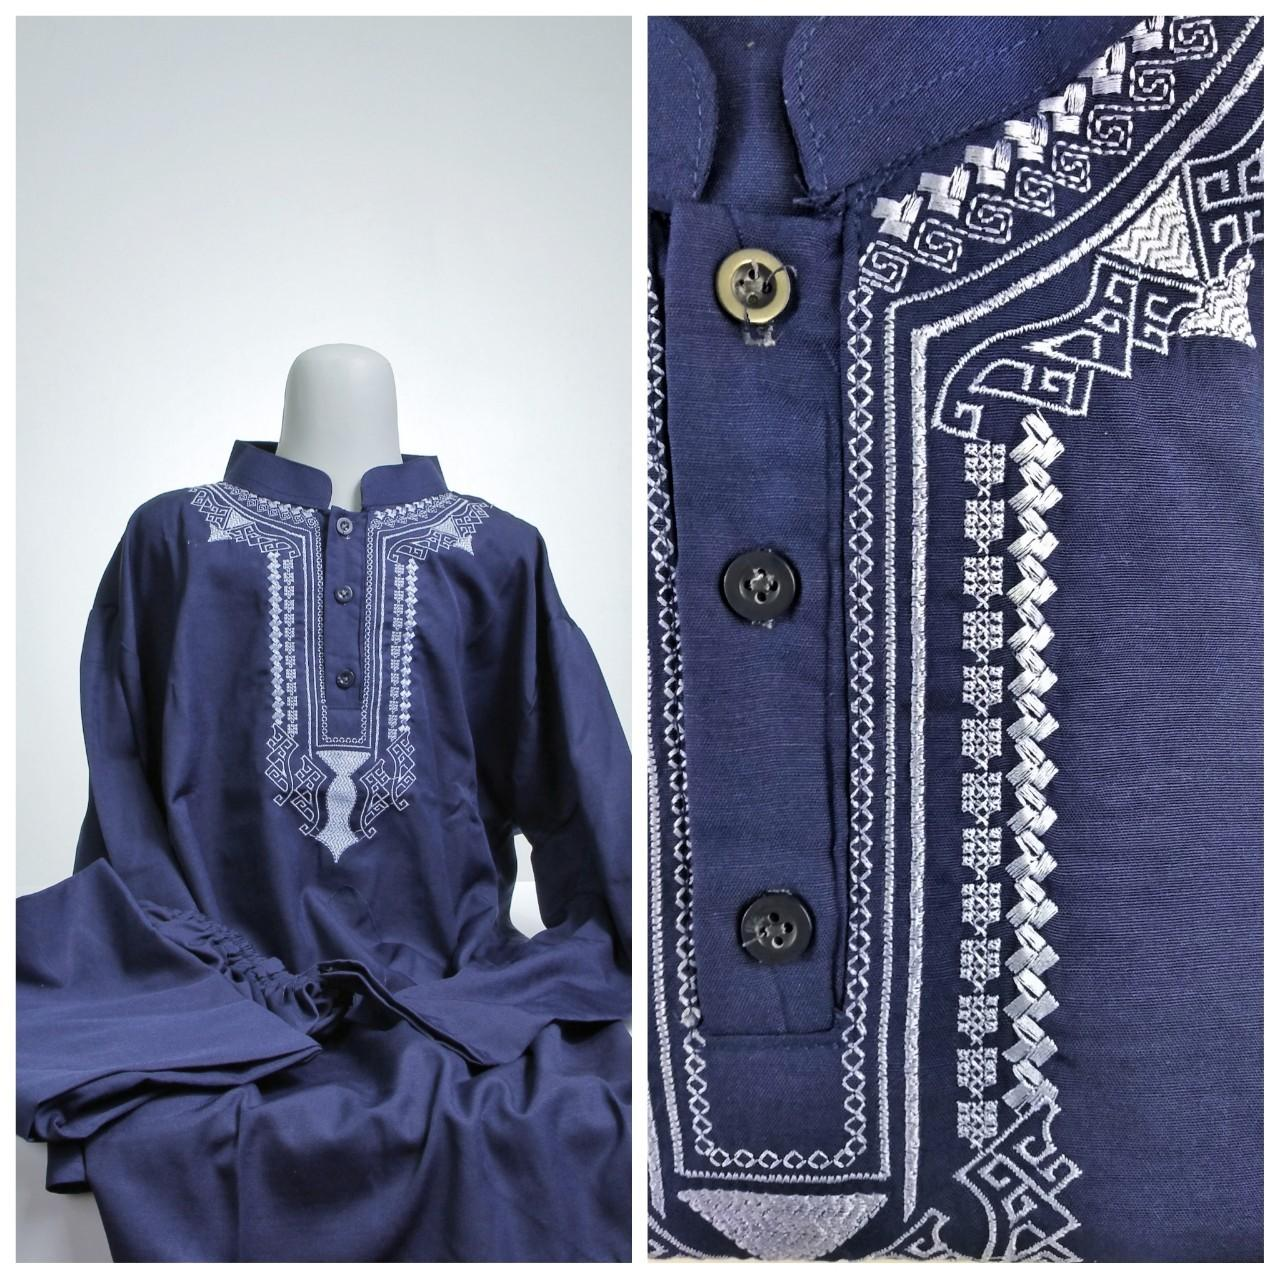 Baju KOKO ANAK Setelan Pakistan Celana Peci Usia Umur 5 6 7 8 9 10 Biru Tua Navy Busana Pakaian Muslim Lebaran